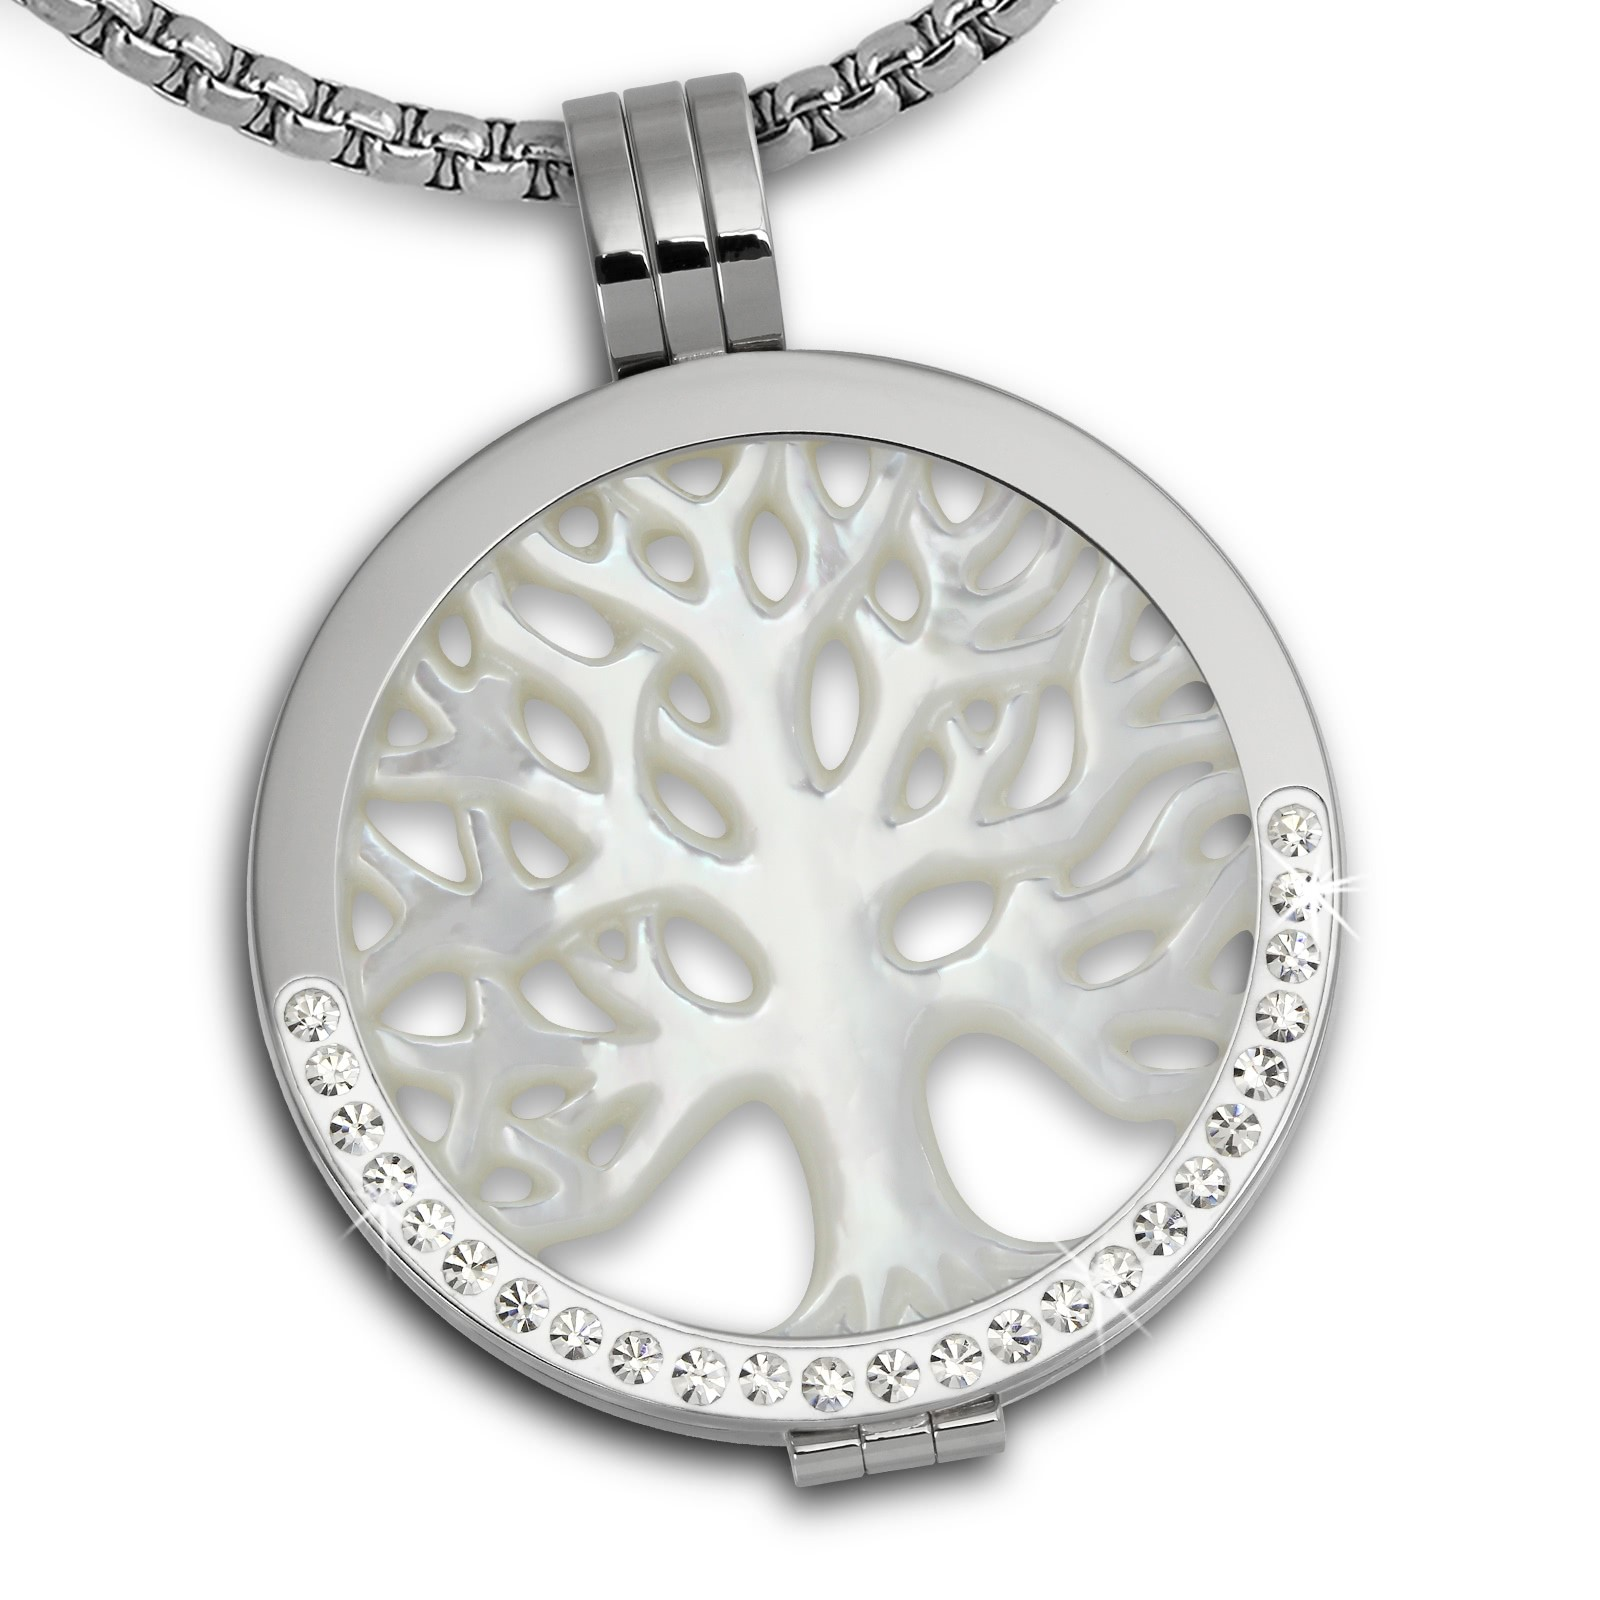 Amello Coins Set Lebendsbaum Edelstahl Kettenanhänger mit Kette 80cm ESCS21E